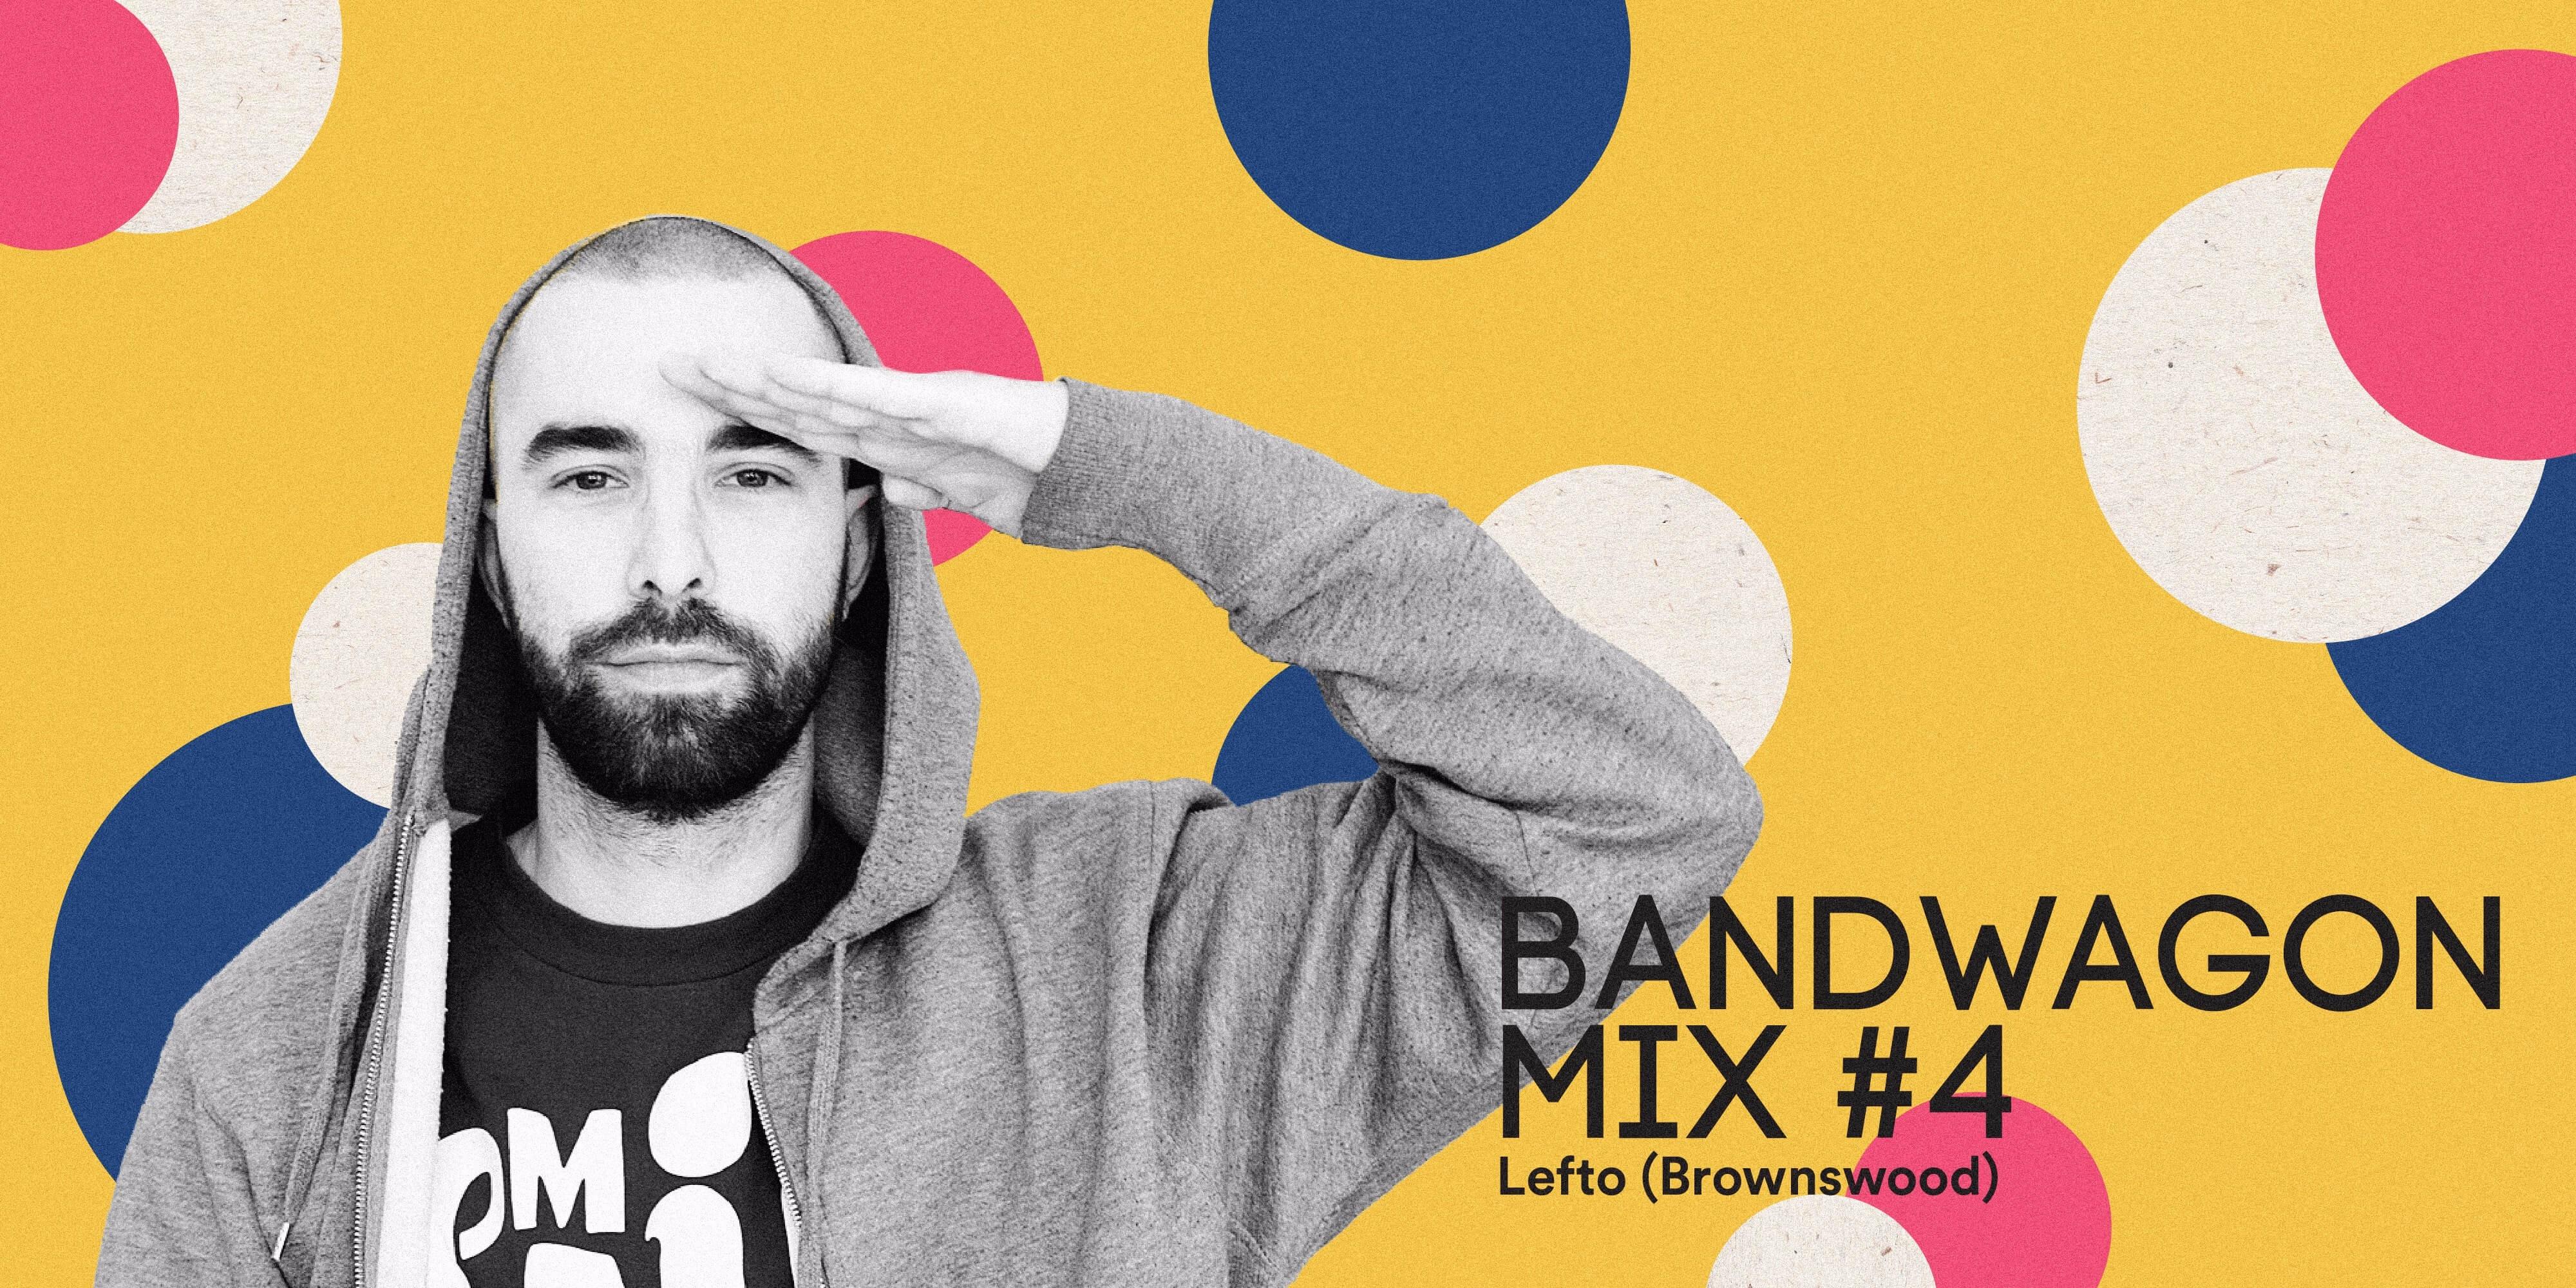 Bandwagon Mix #4: LEFTO (Brownswood)